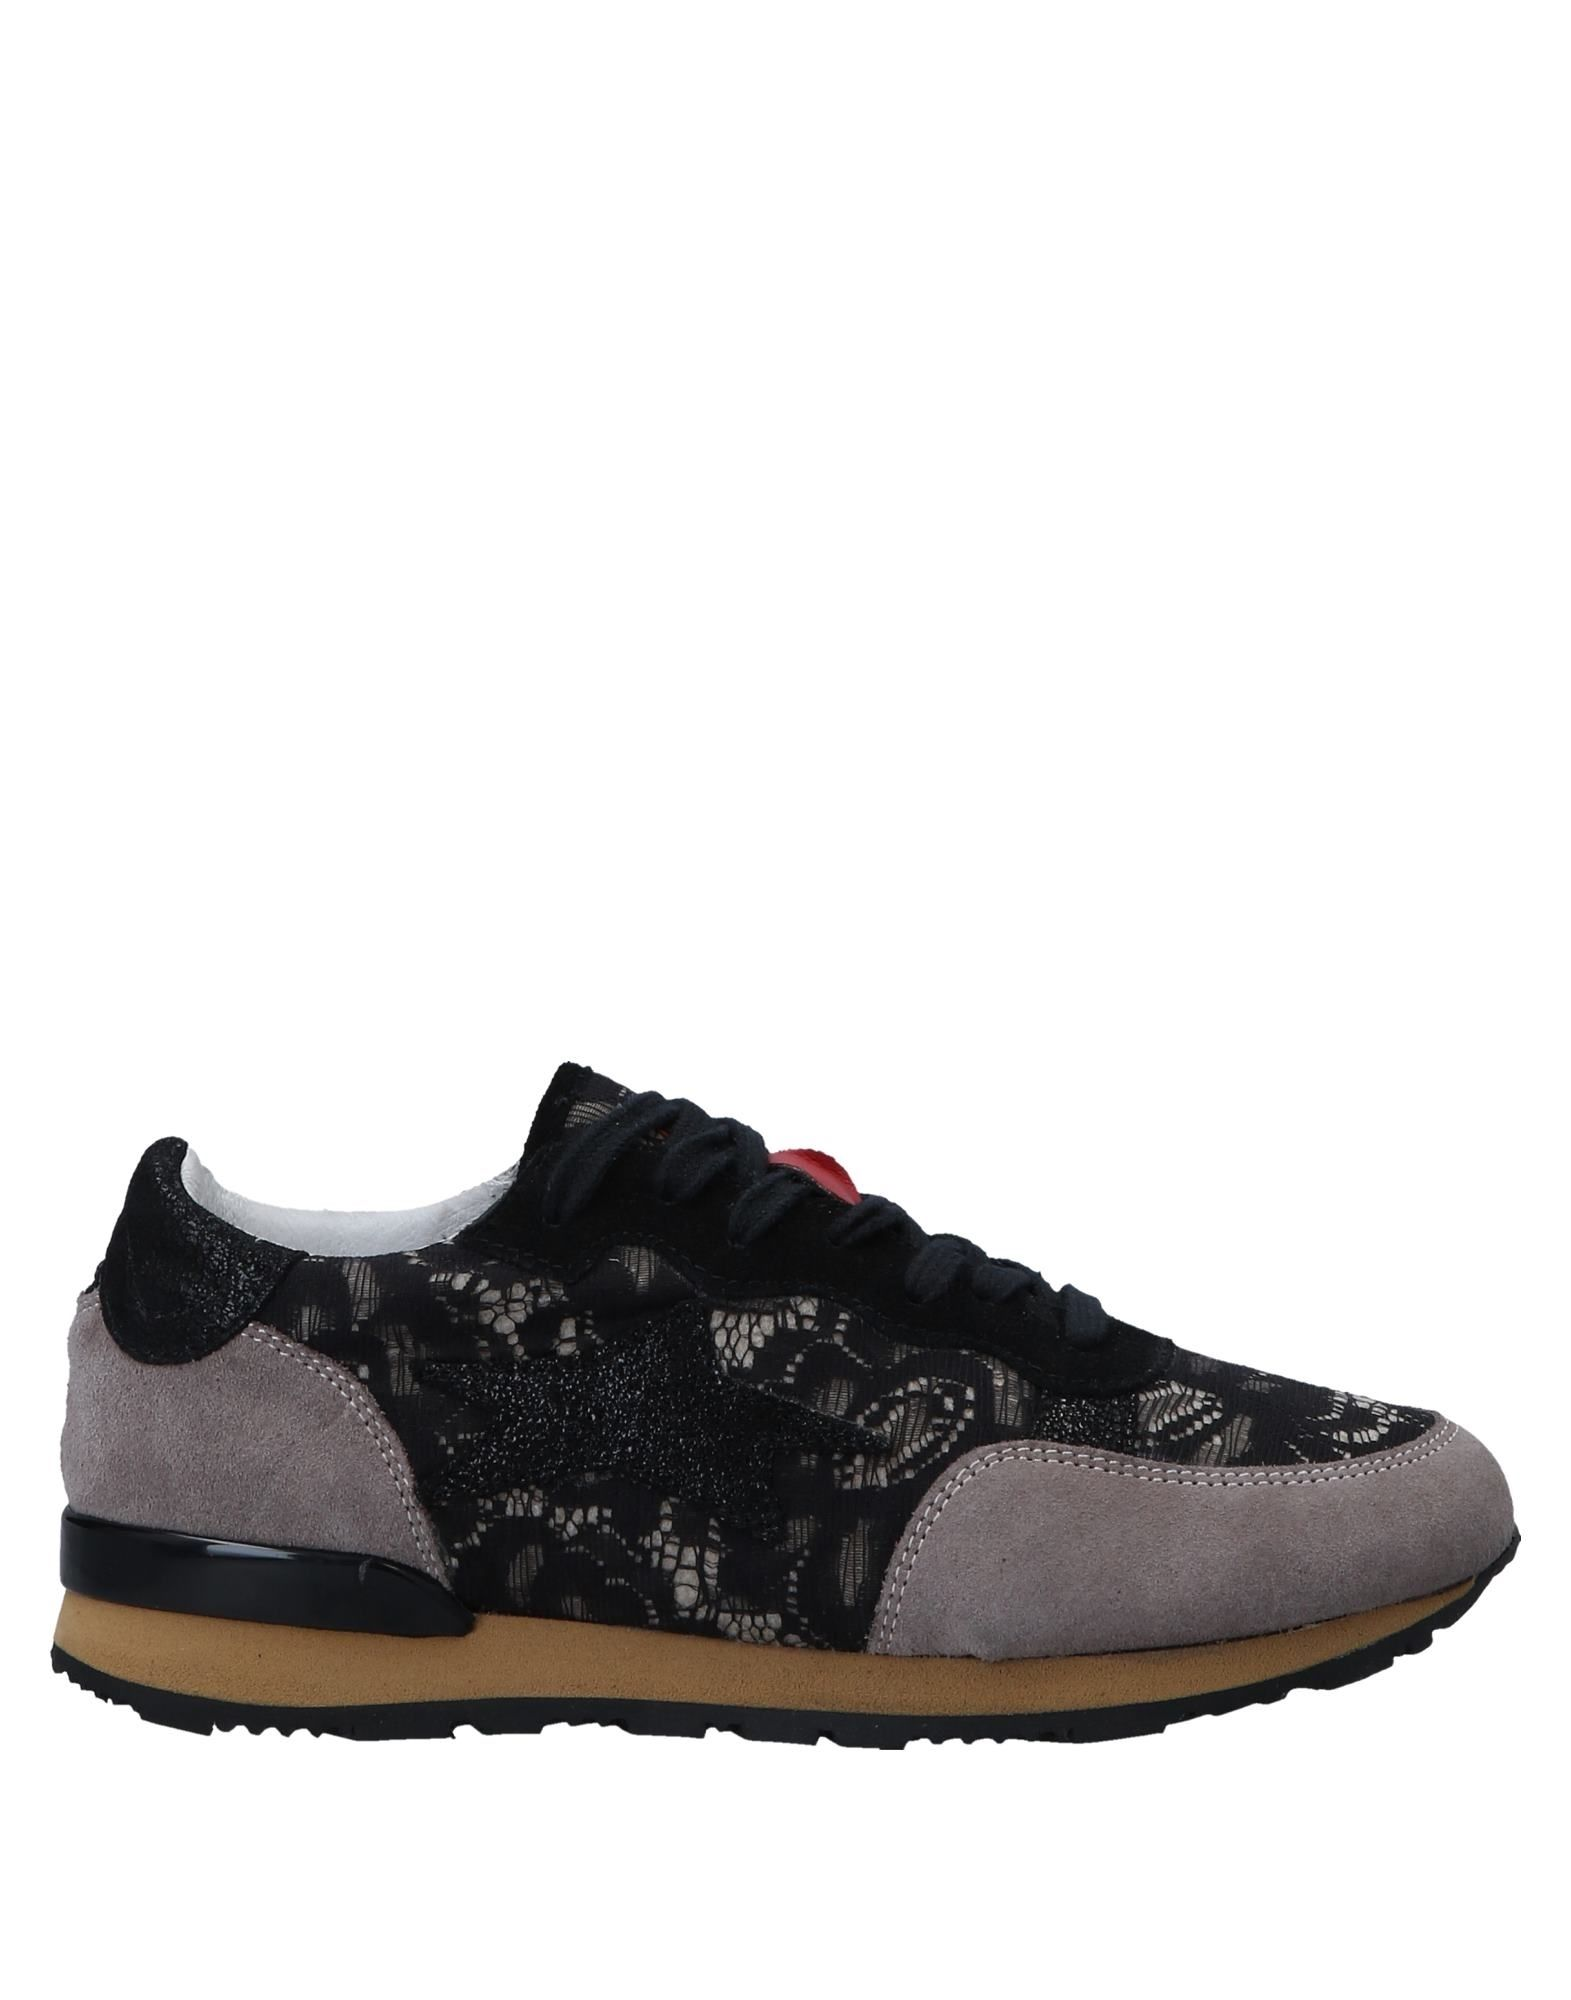 Ishikawa Sneakers online - Women Ishikawa Sneakers online Sneakers on  Canada - 11558683NO fb84e5